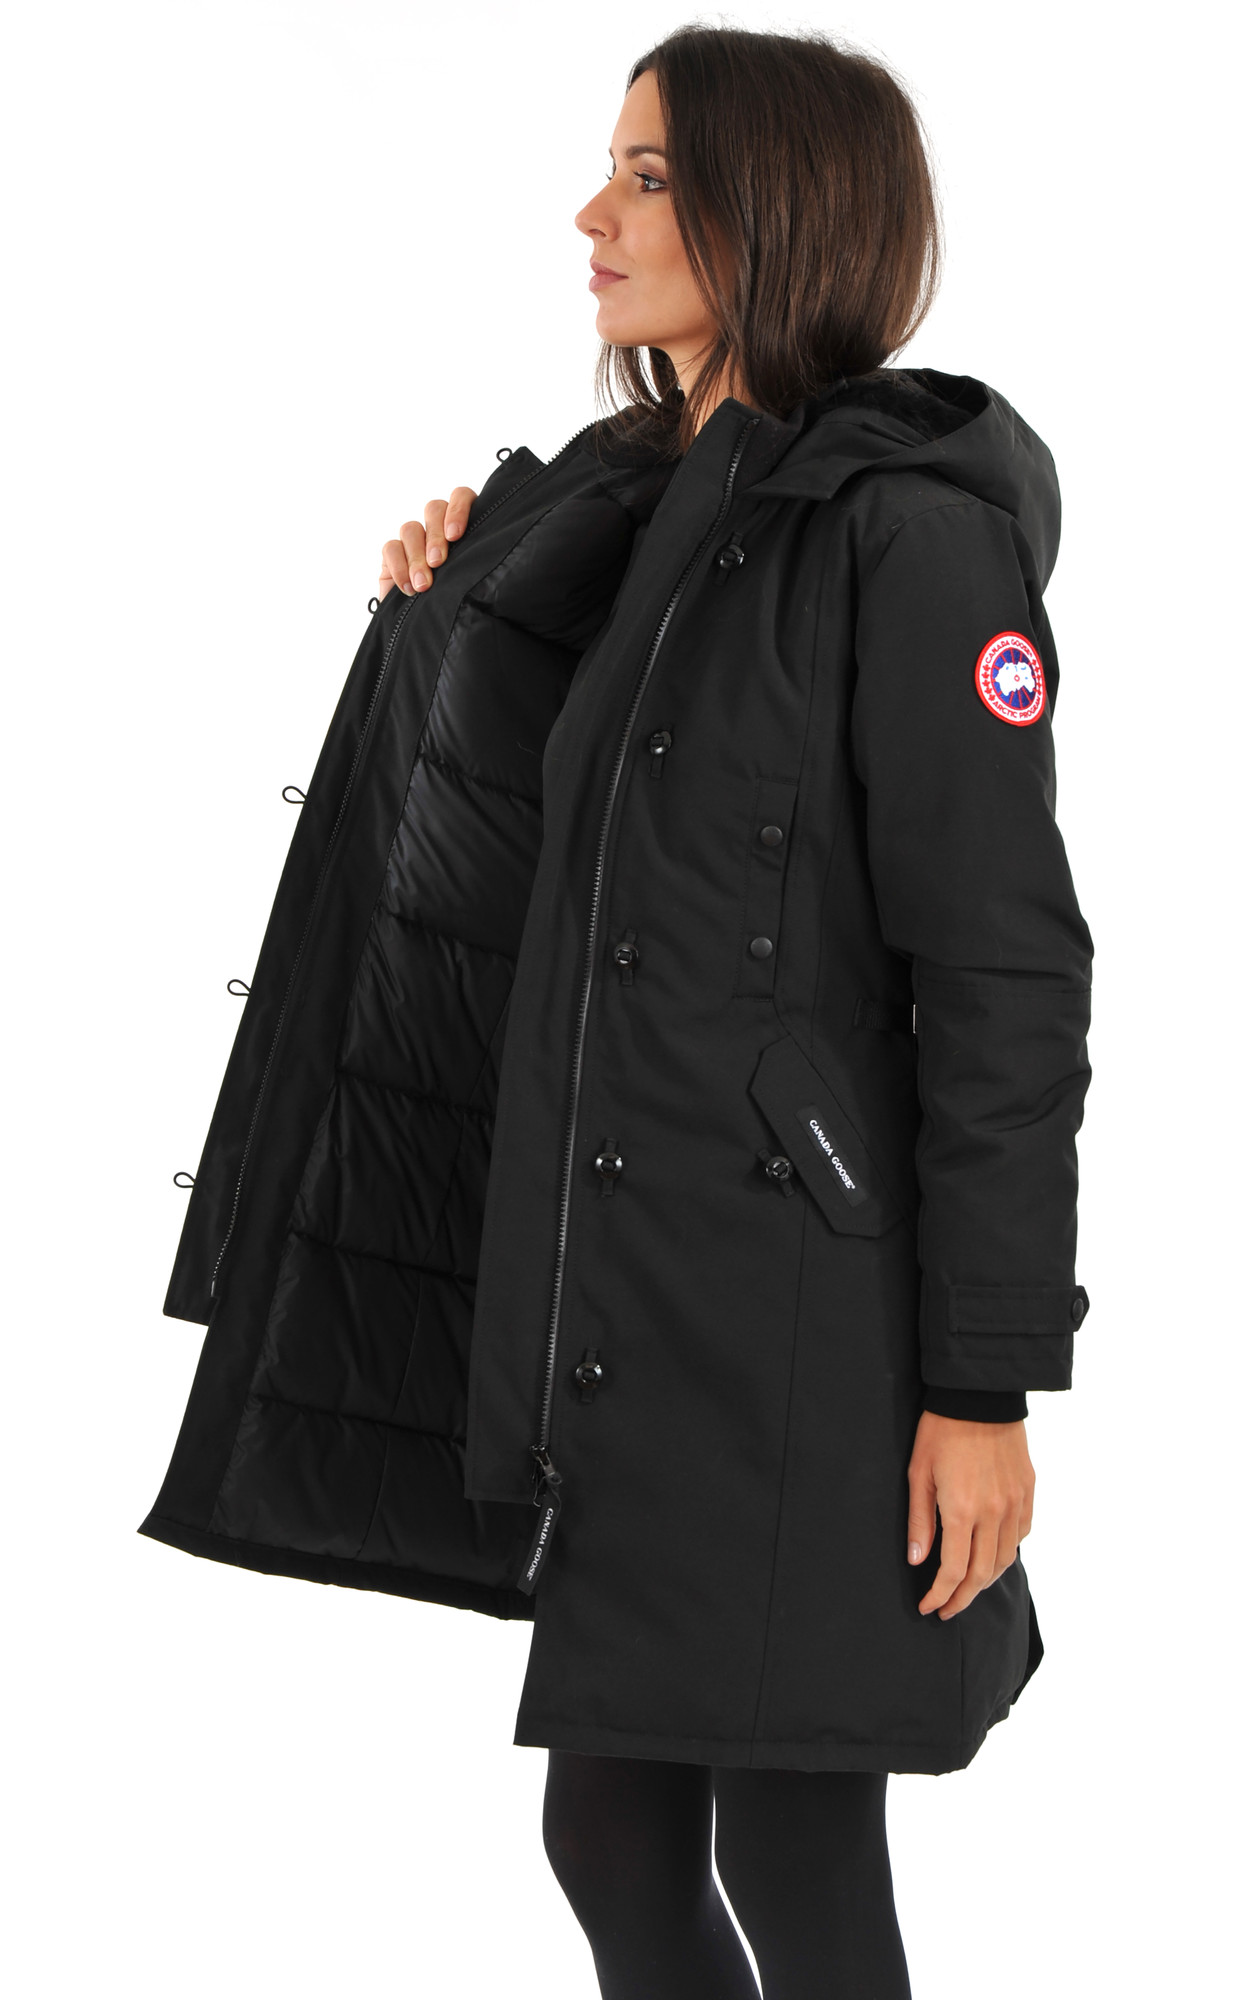 Marque manteau femme canada